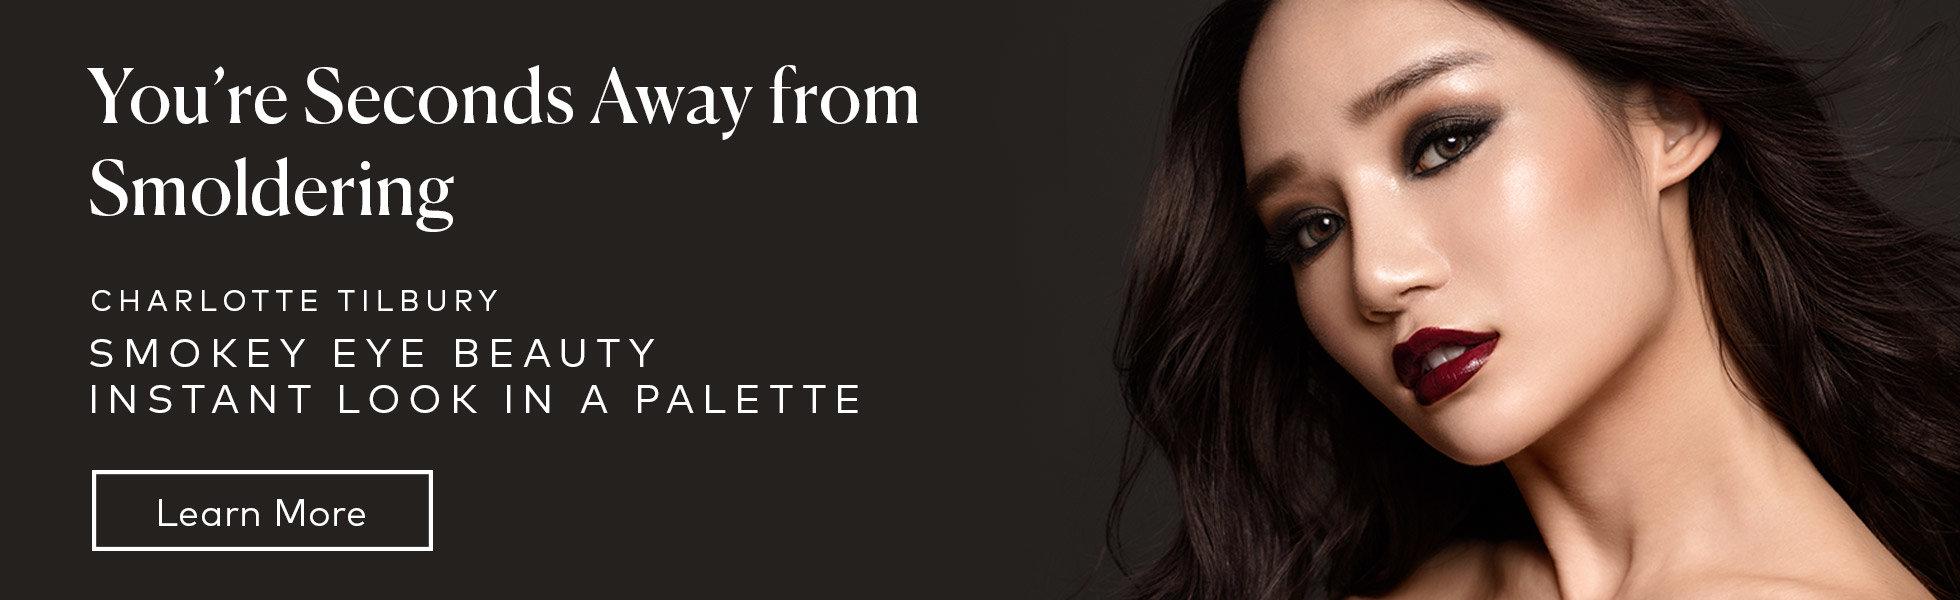 Charlotte Tilbury Beautylish Frnd Cosmetics Uptown Girl Set Smokey Eye Beauty Instant Look In A Palette